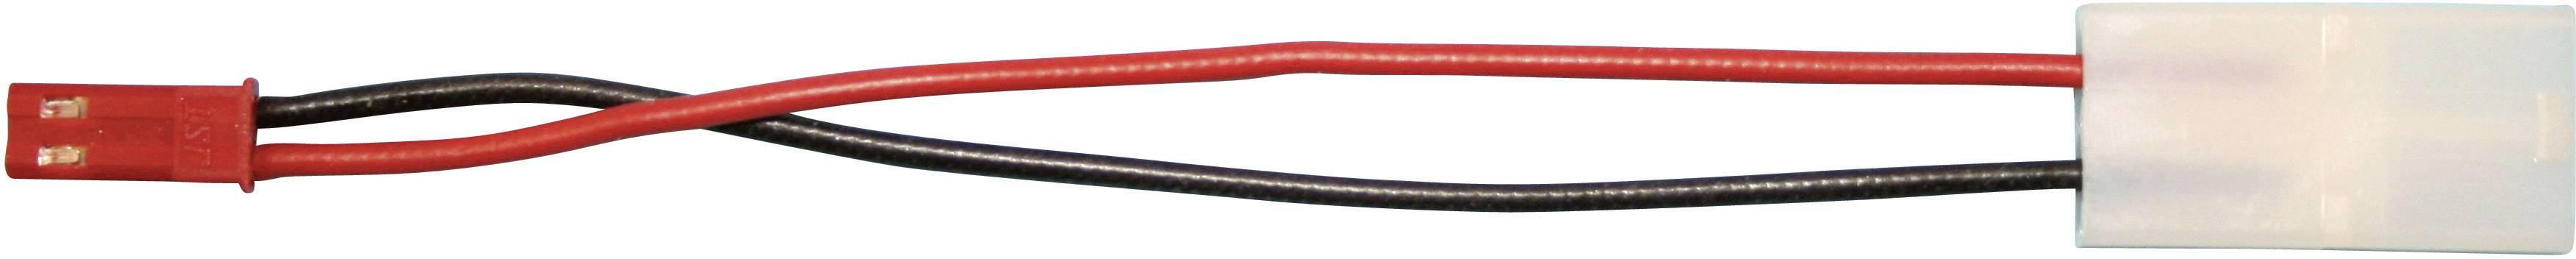 Redukce BEC zásuvka / Tamiya zástrčka Modelcraft, 100 mm, 0,5 mm²